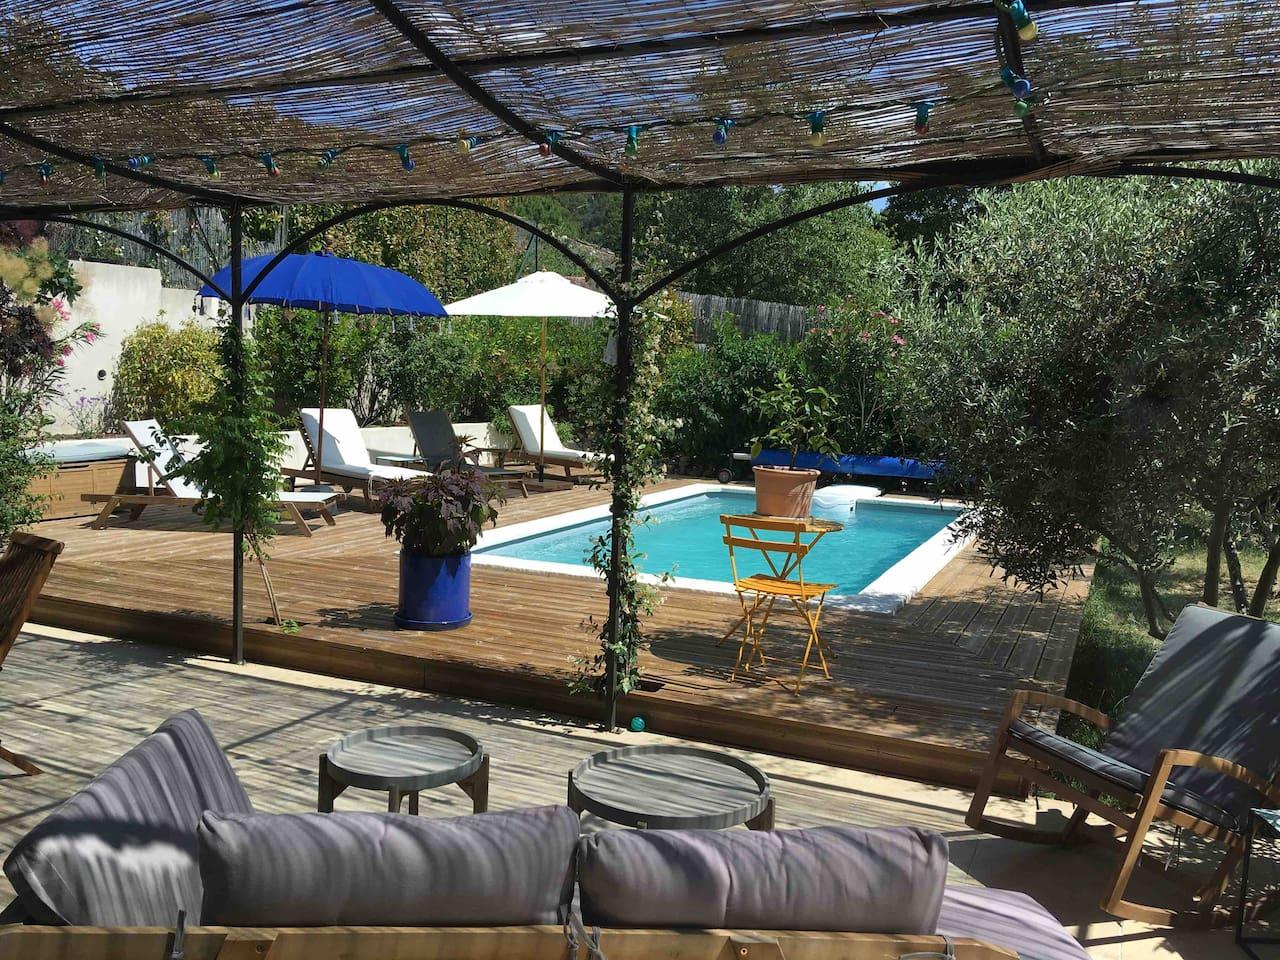 Notre jardin avec piscine